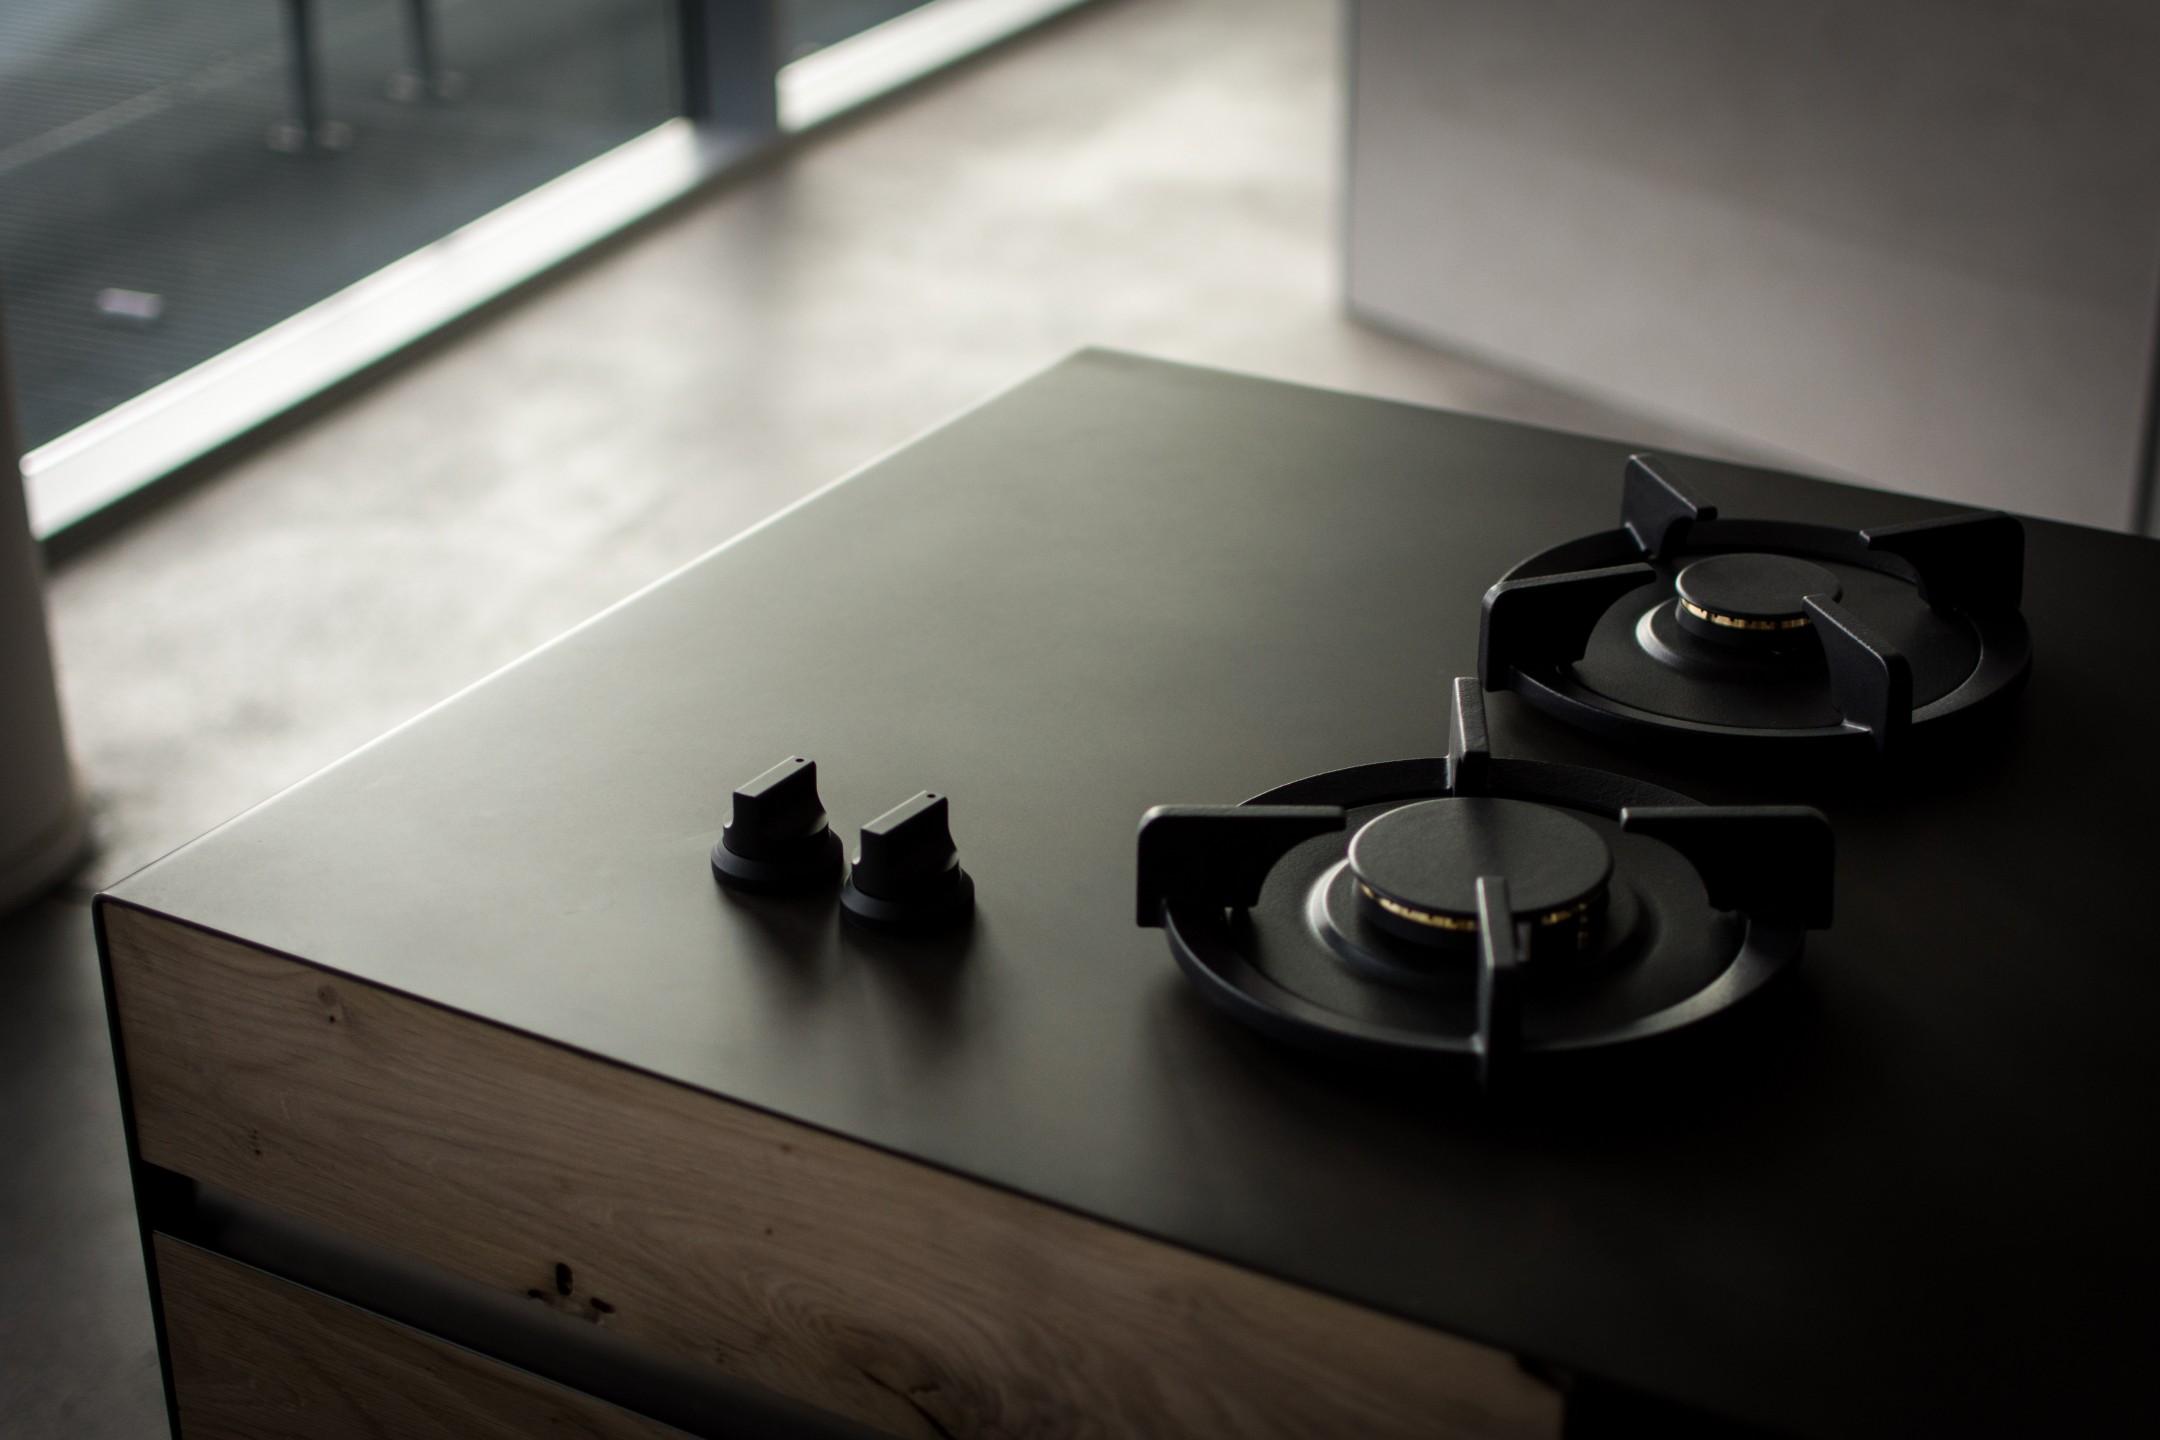 squarerooms-kitchen-stove-clean-new-sleek-smooth-black